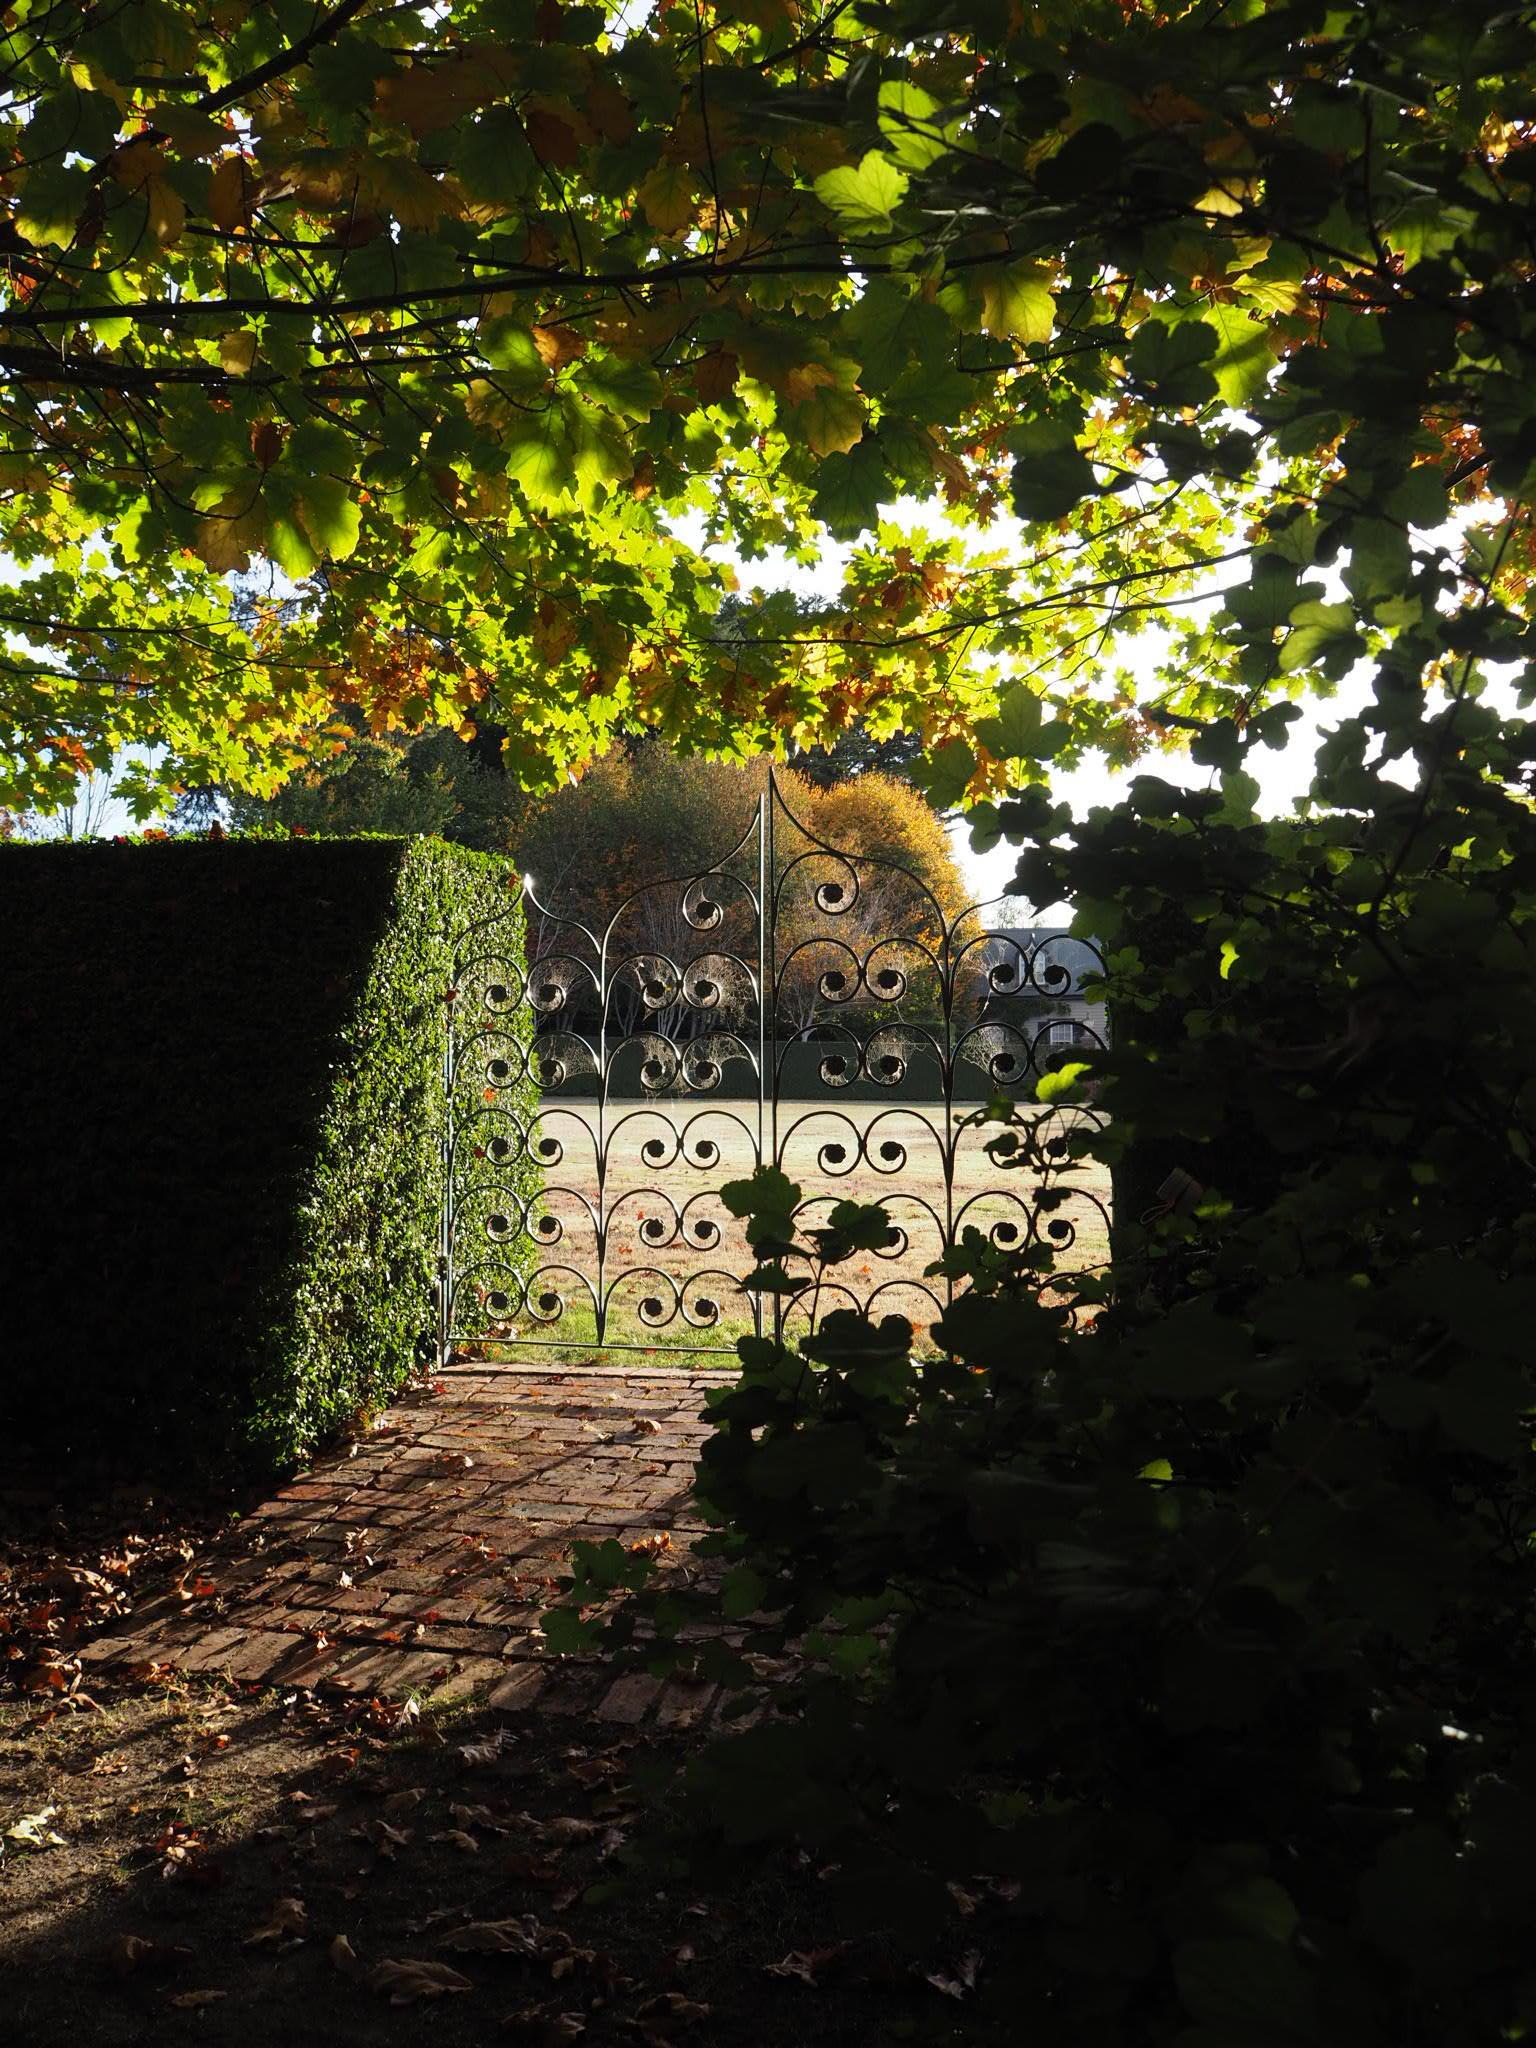 muskfarm_autumn_morning_light_photography_musk_IMG_3395.JPG